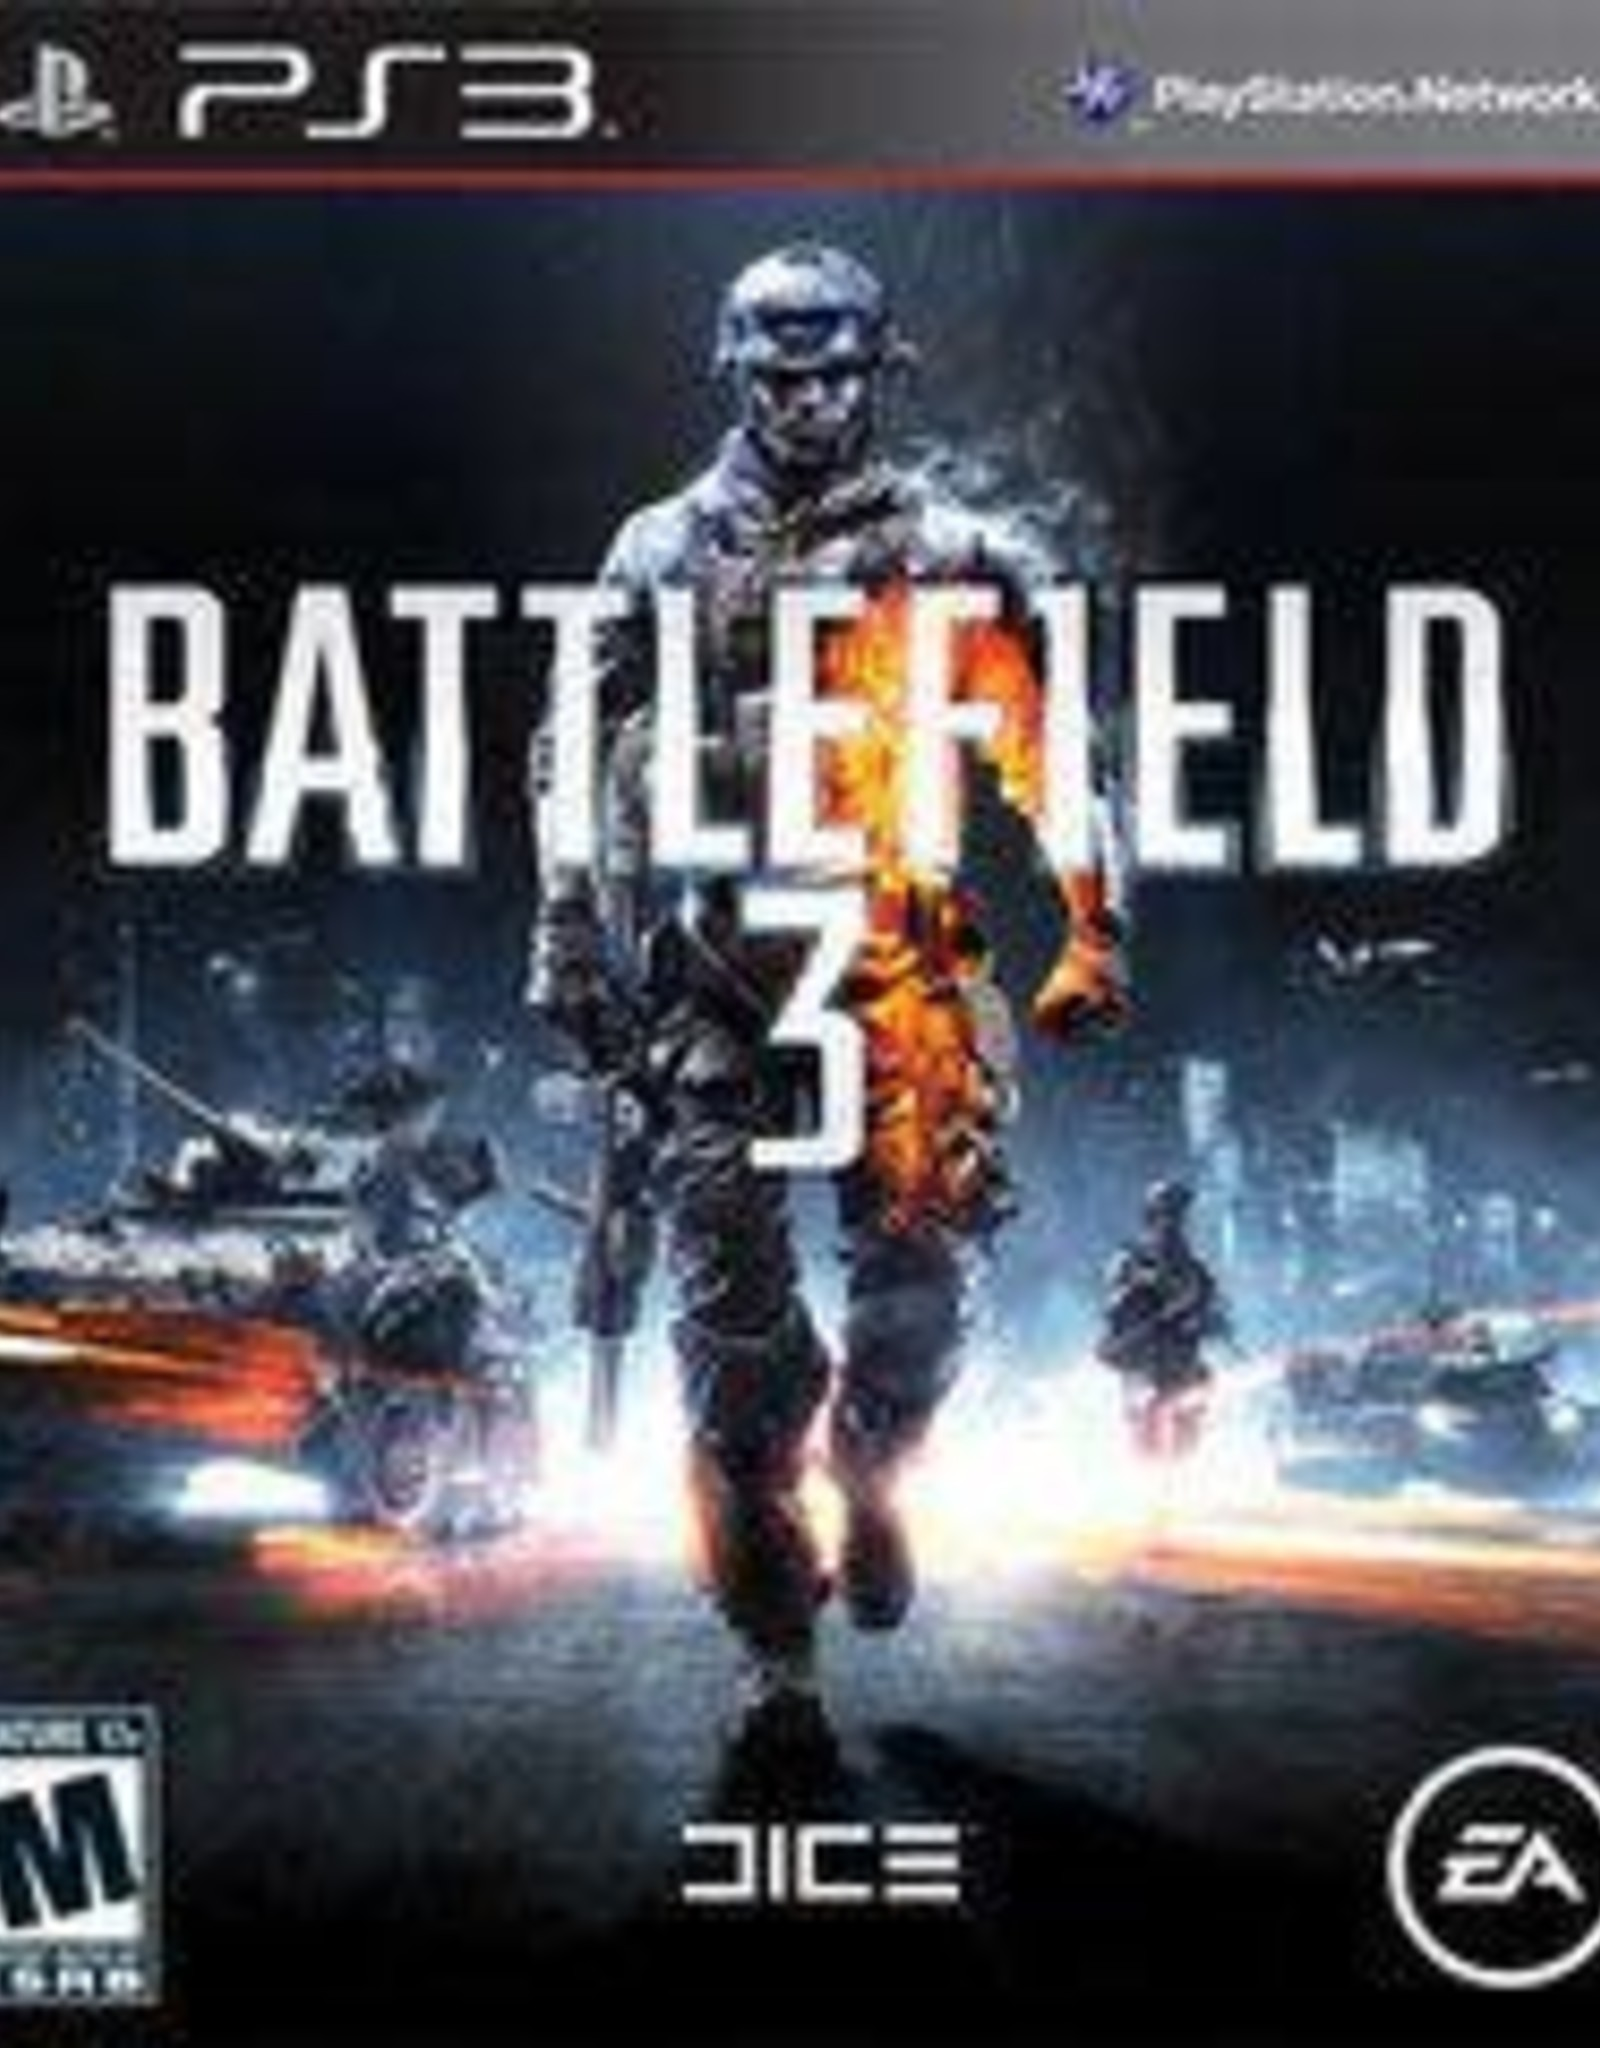 Playstation 3 Battlefield 3